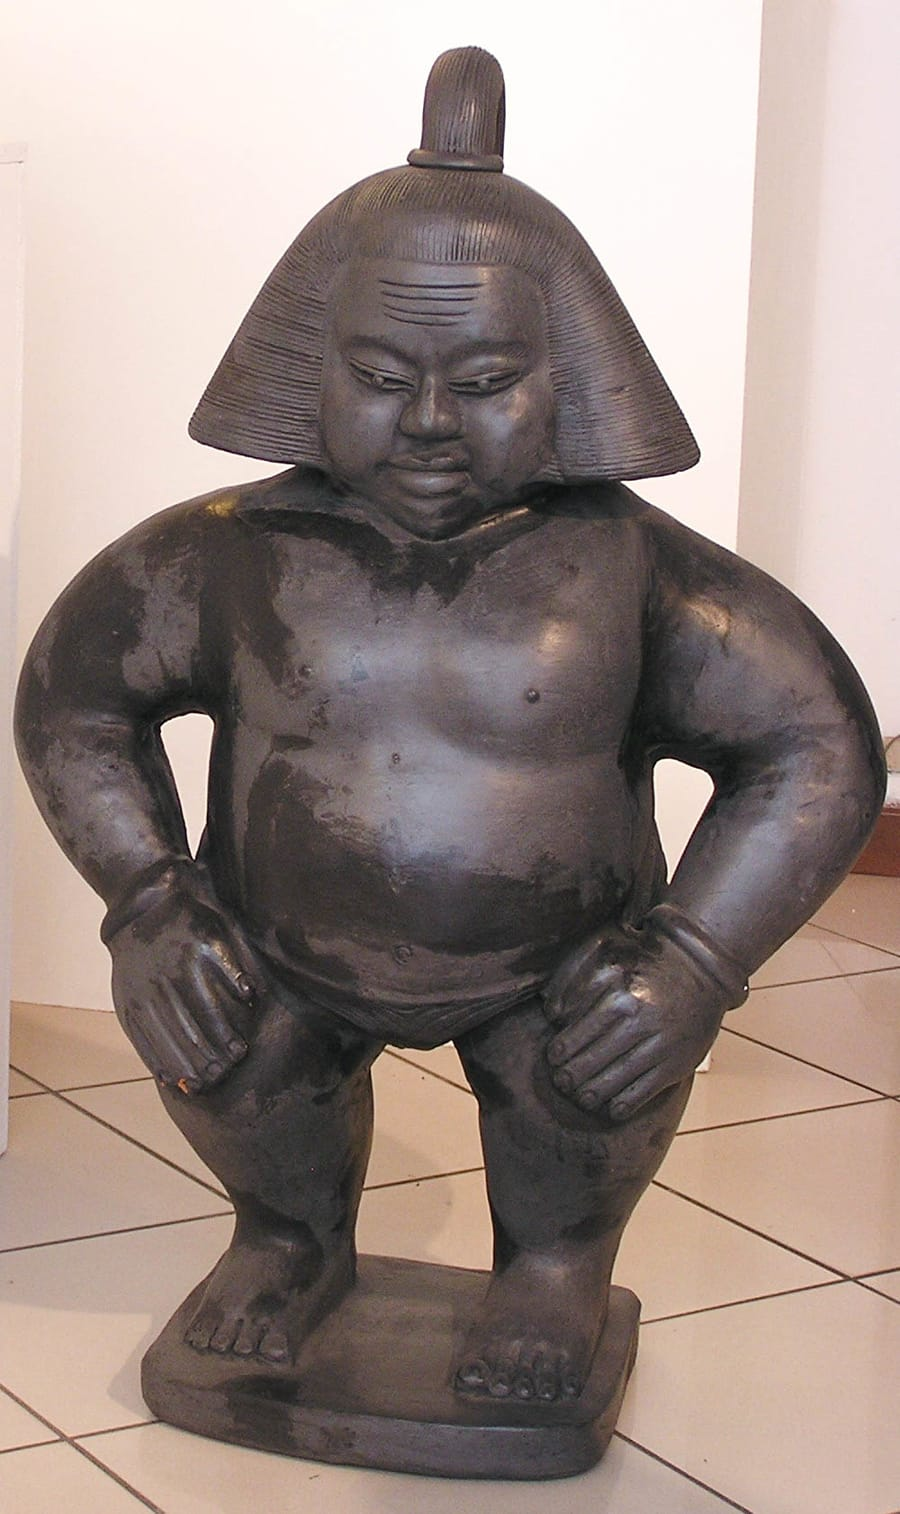 Restauro statua asiatica in ceramica dal colore scuro